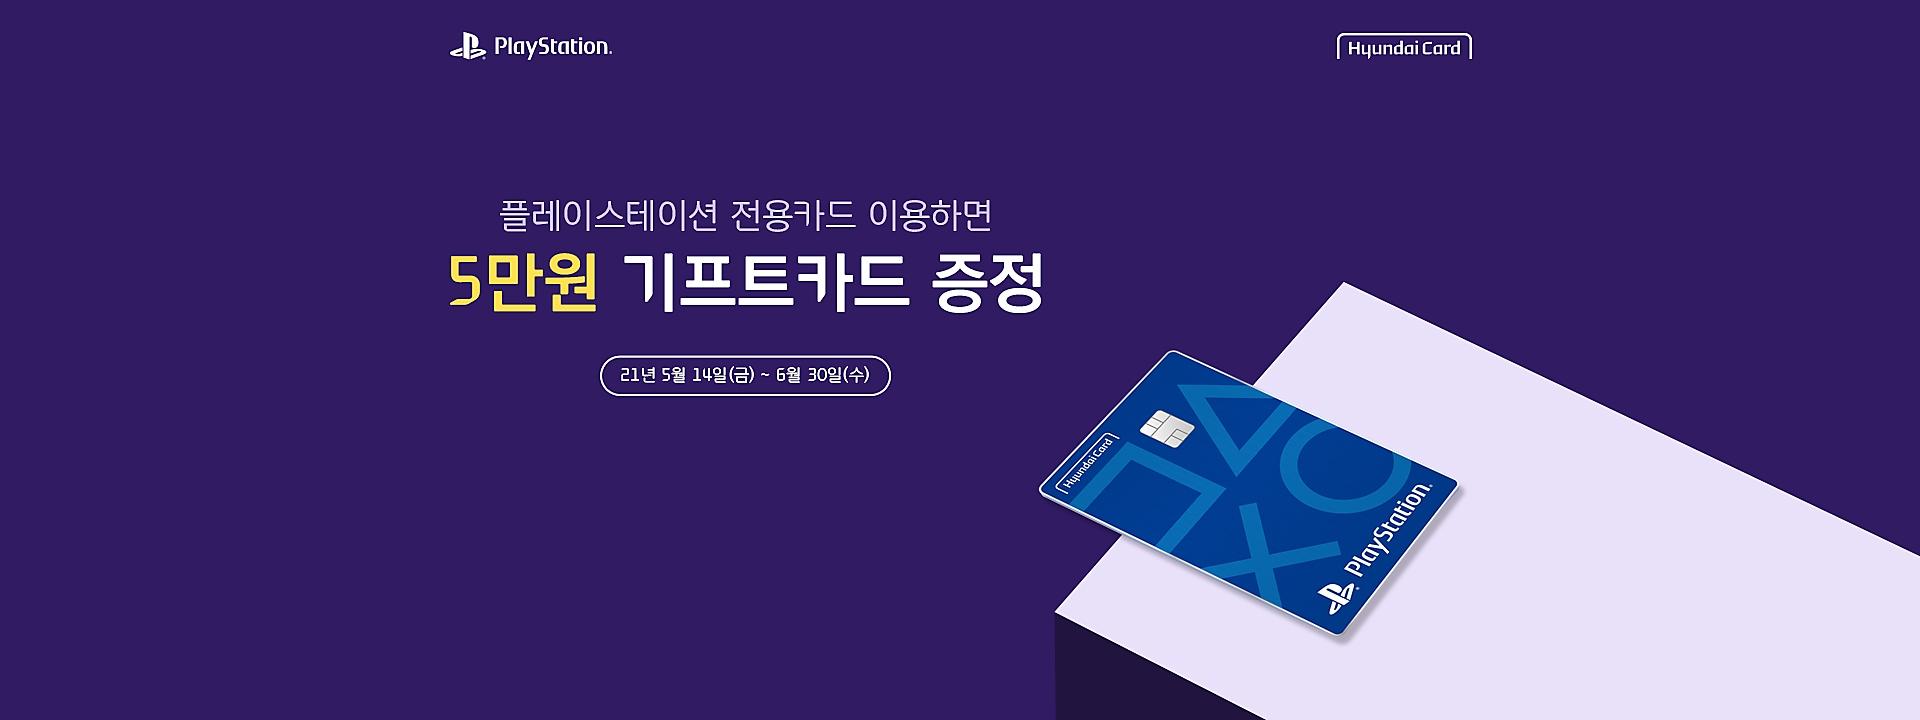 PlayStation® - 현대카드M 첫 결제 고객에게 PlayStation™Store 기프트카드 5만원권을 드립니다. 기간: 2021년 5월 14일 ~ 6월 30일